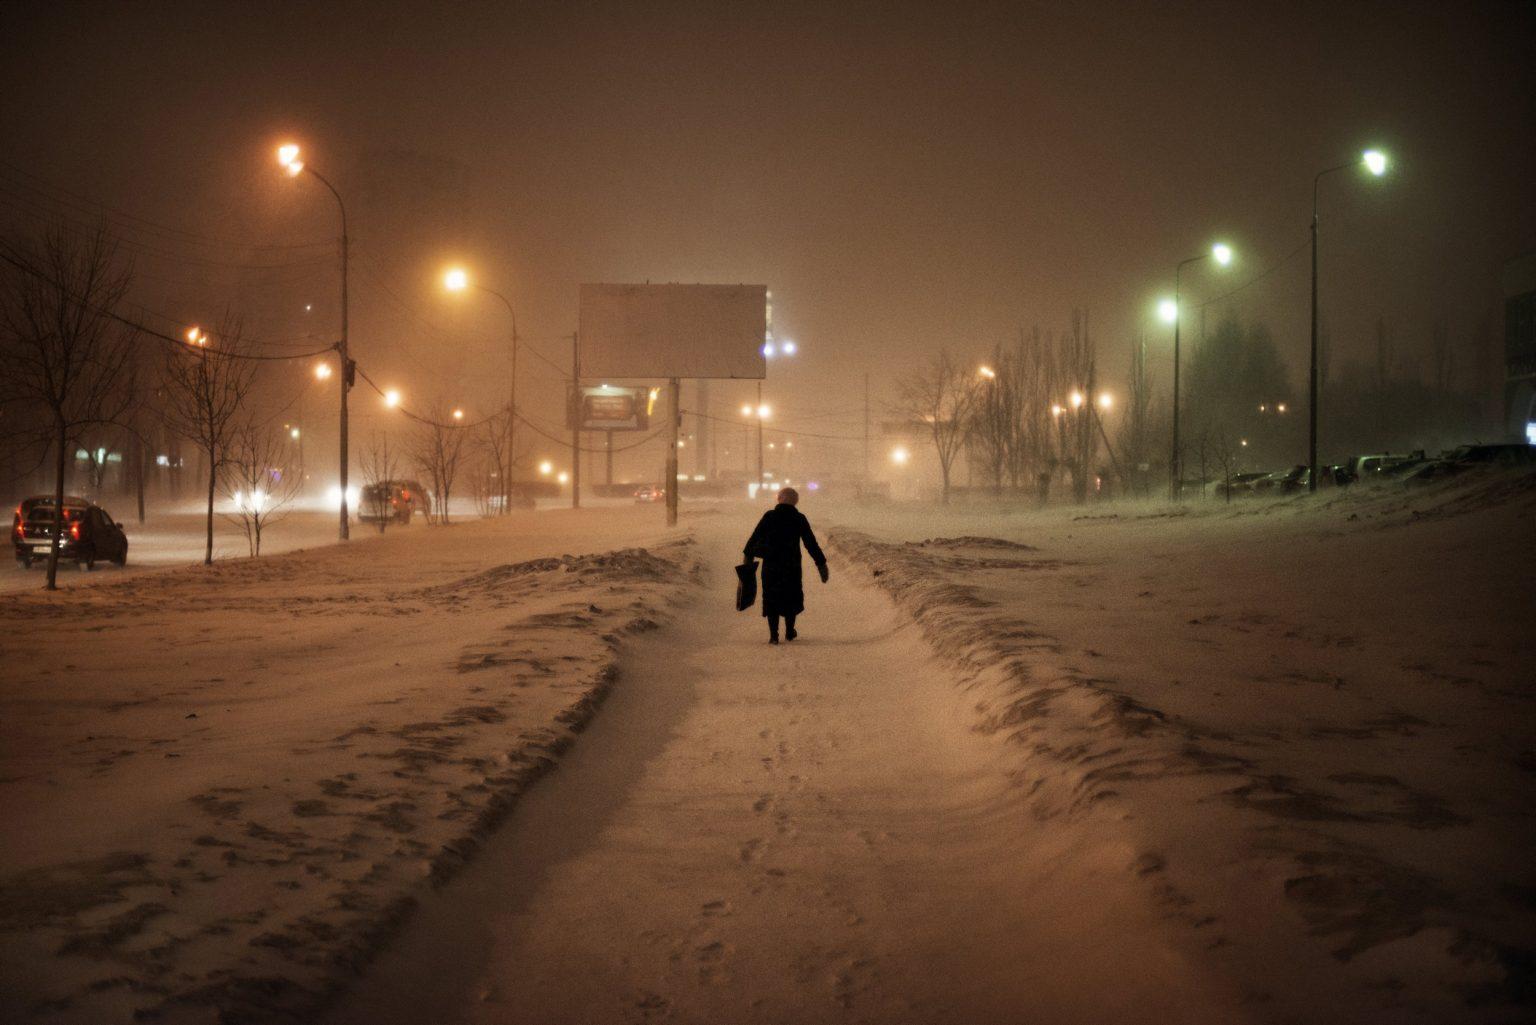 Yekaterinburg, Russia, March 2013 - A woman walks on a street in the outskirts of Yekaterinburg. >< Yekaterinburg, Russia, marzo 2013 - Una donna cammina lungo una strada nella periferia di Yekaterinburg.